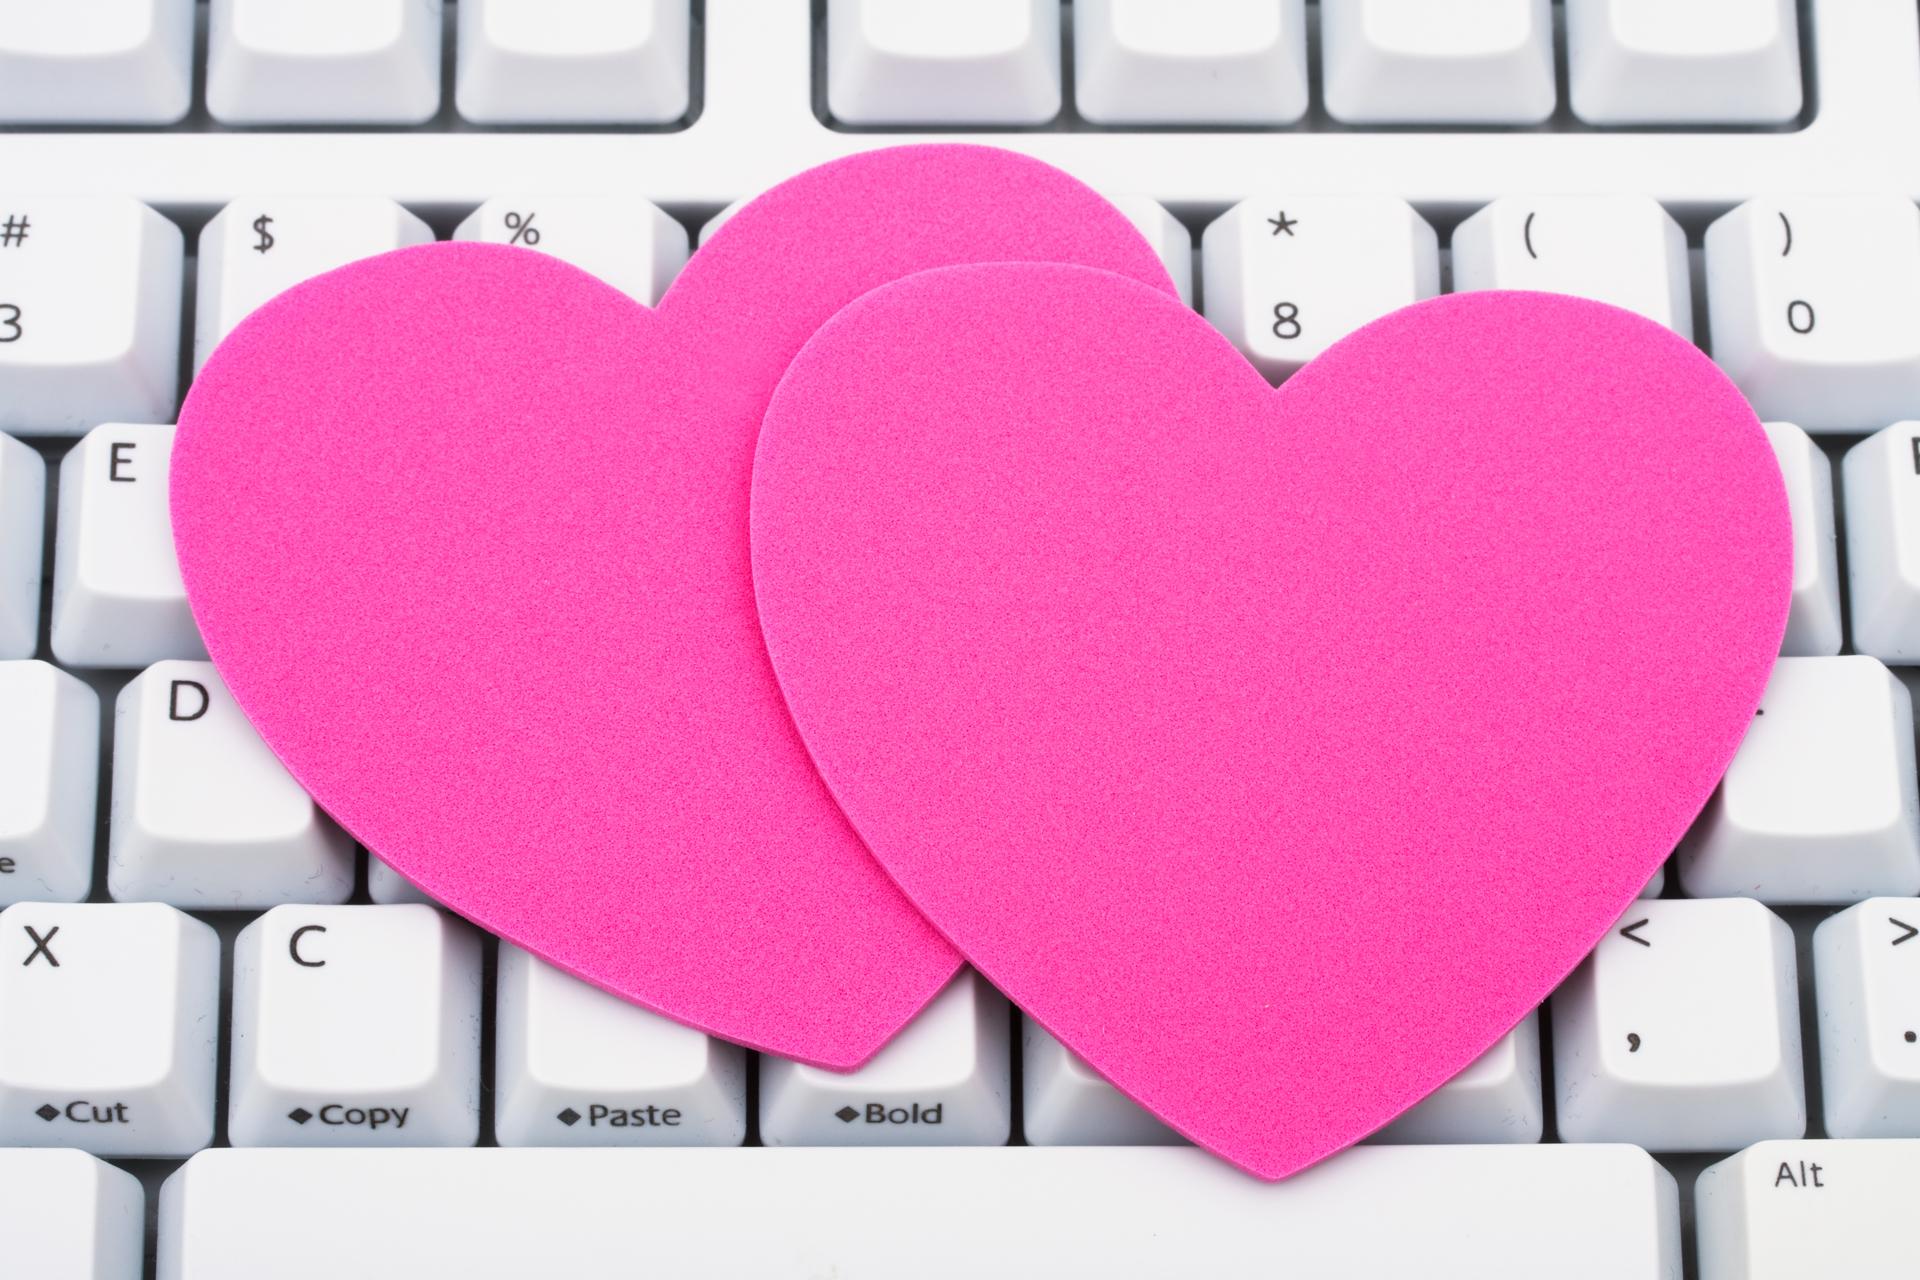 Online dating stocks news and analysis